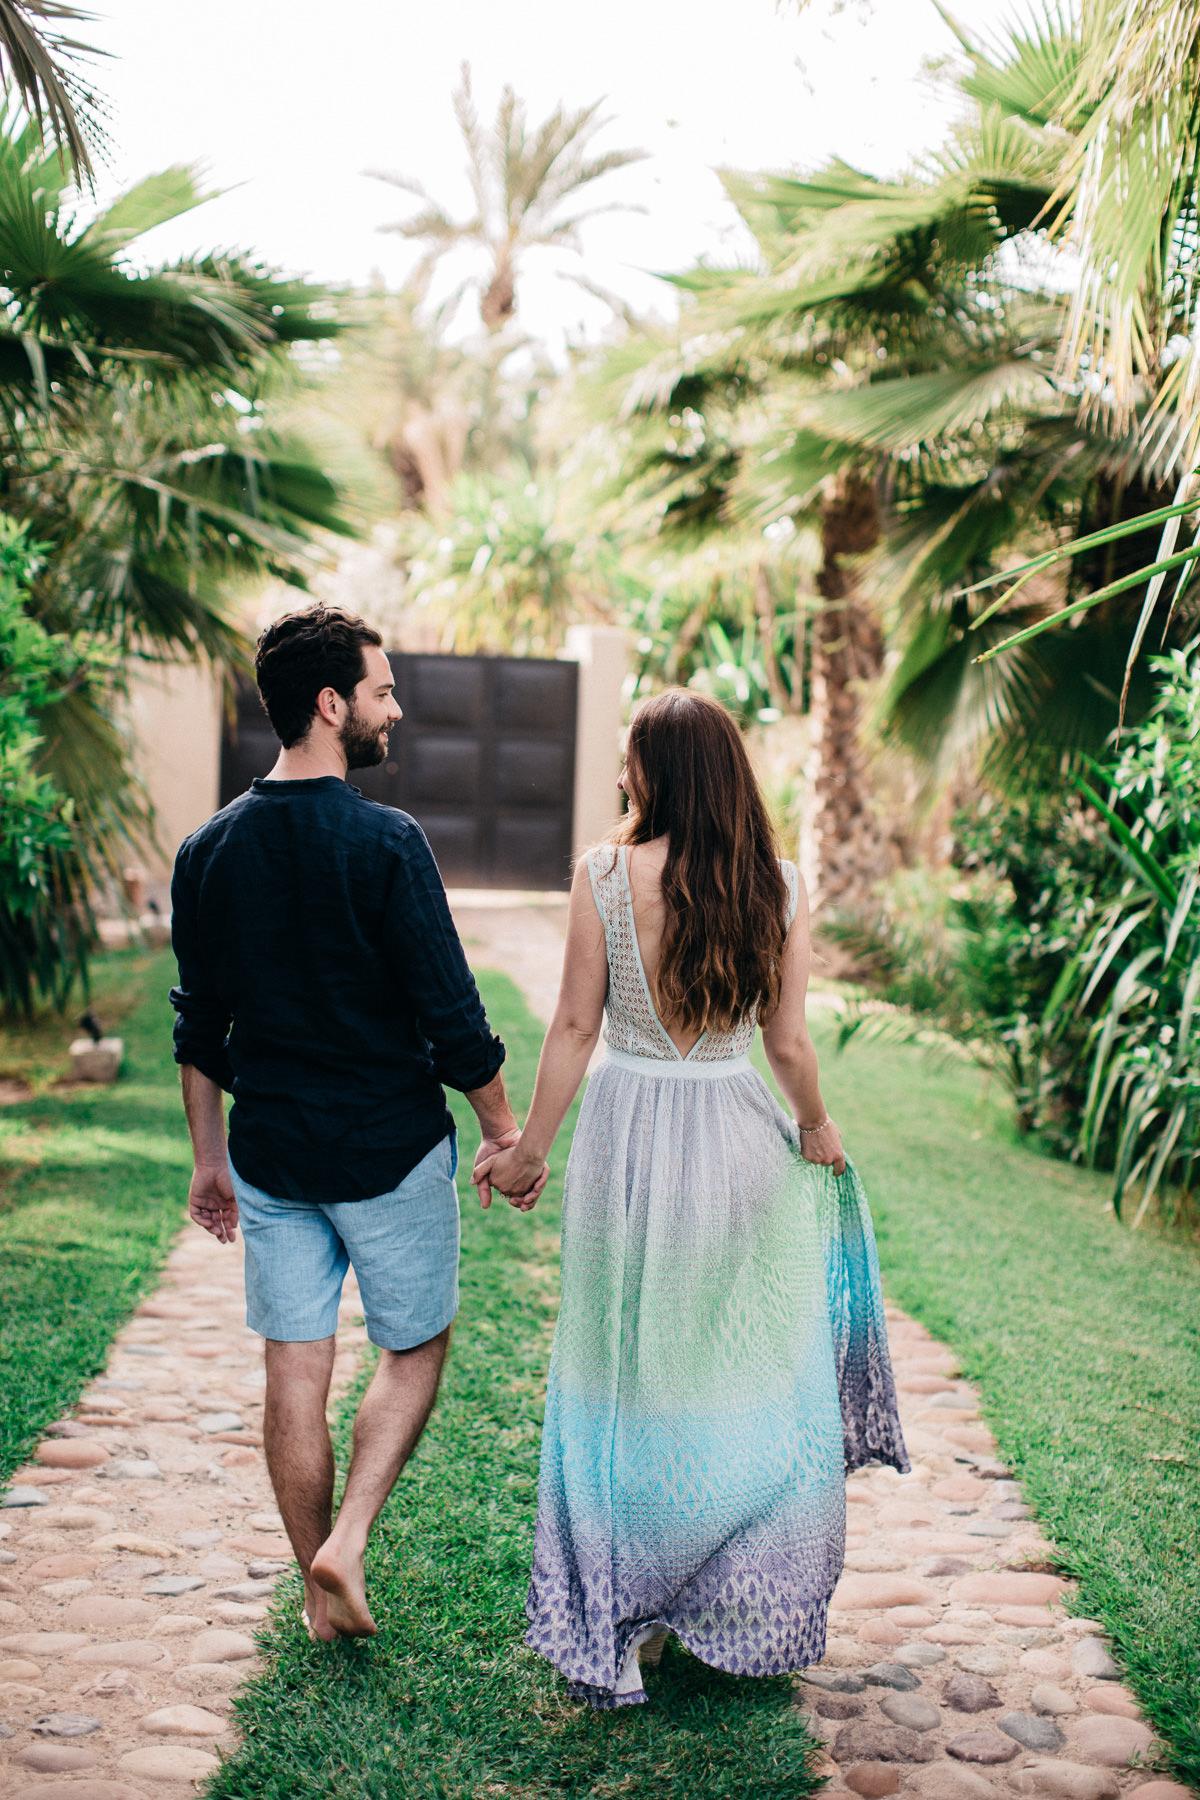 0673-lifestories-mariage-marrakech-2016-TiffxPJ-MK3_0671